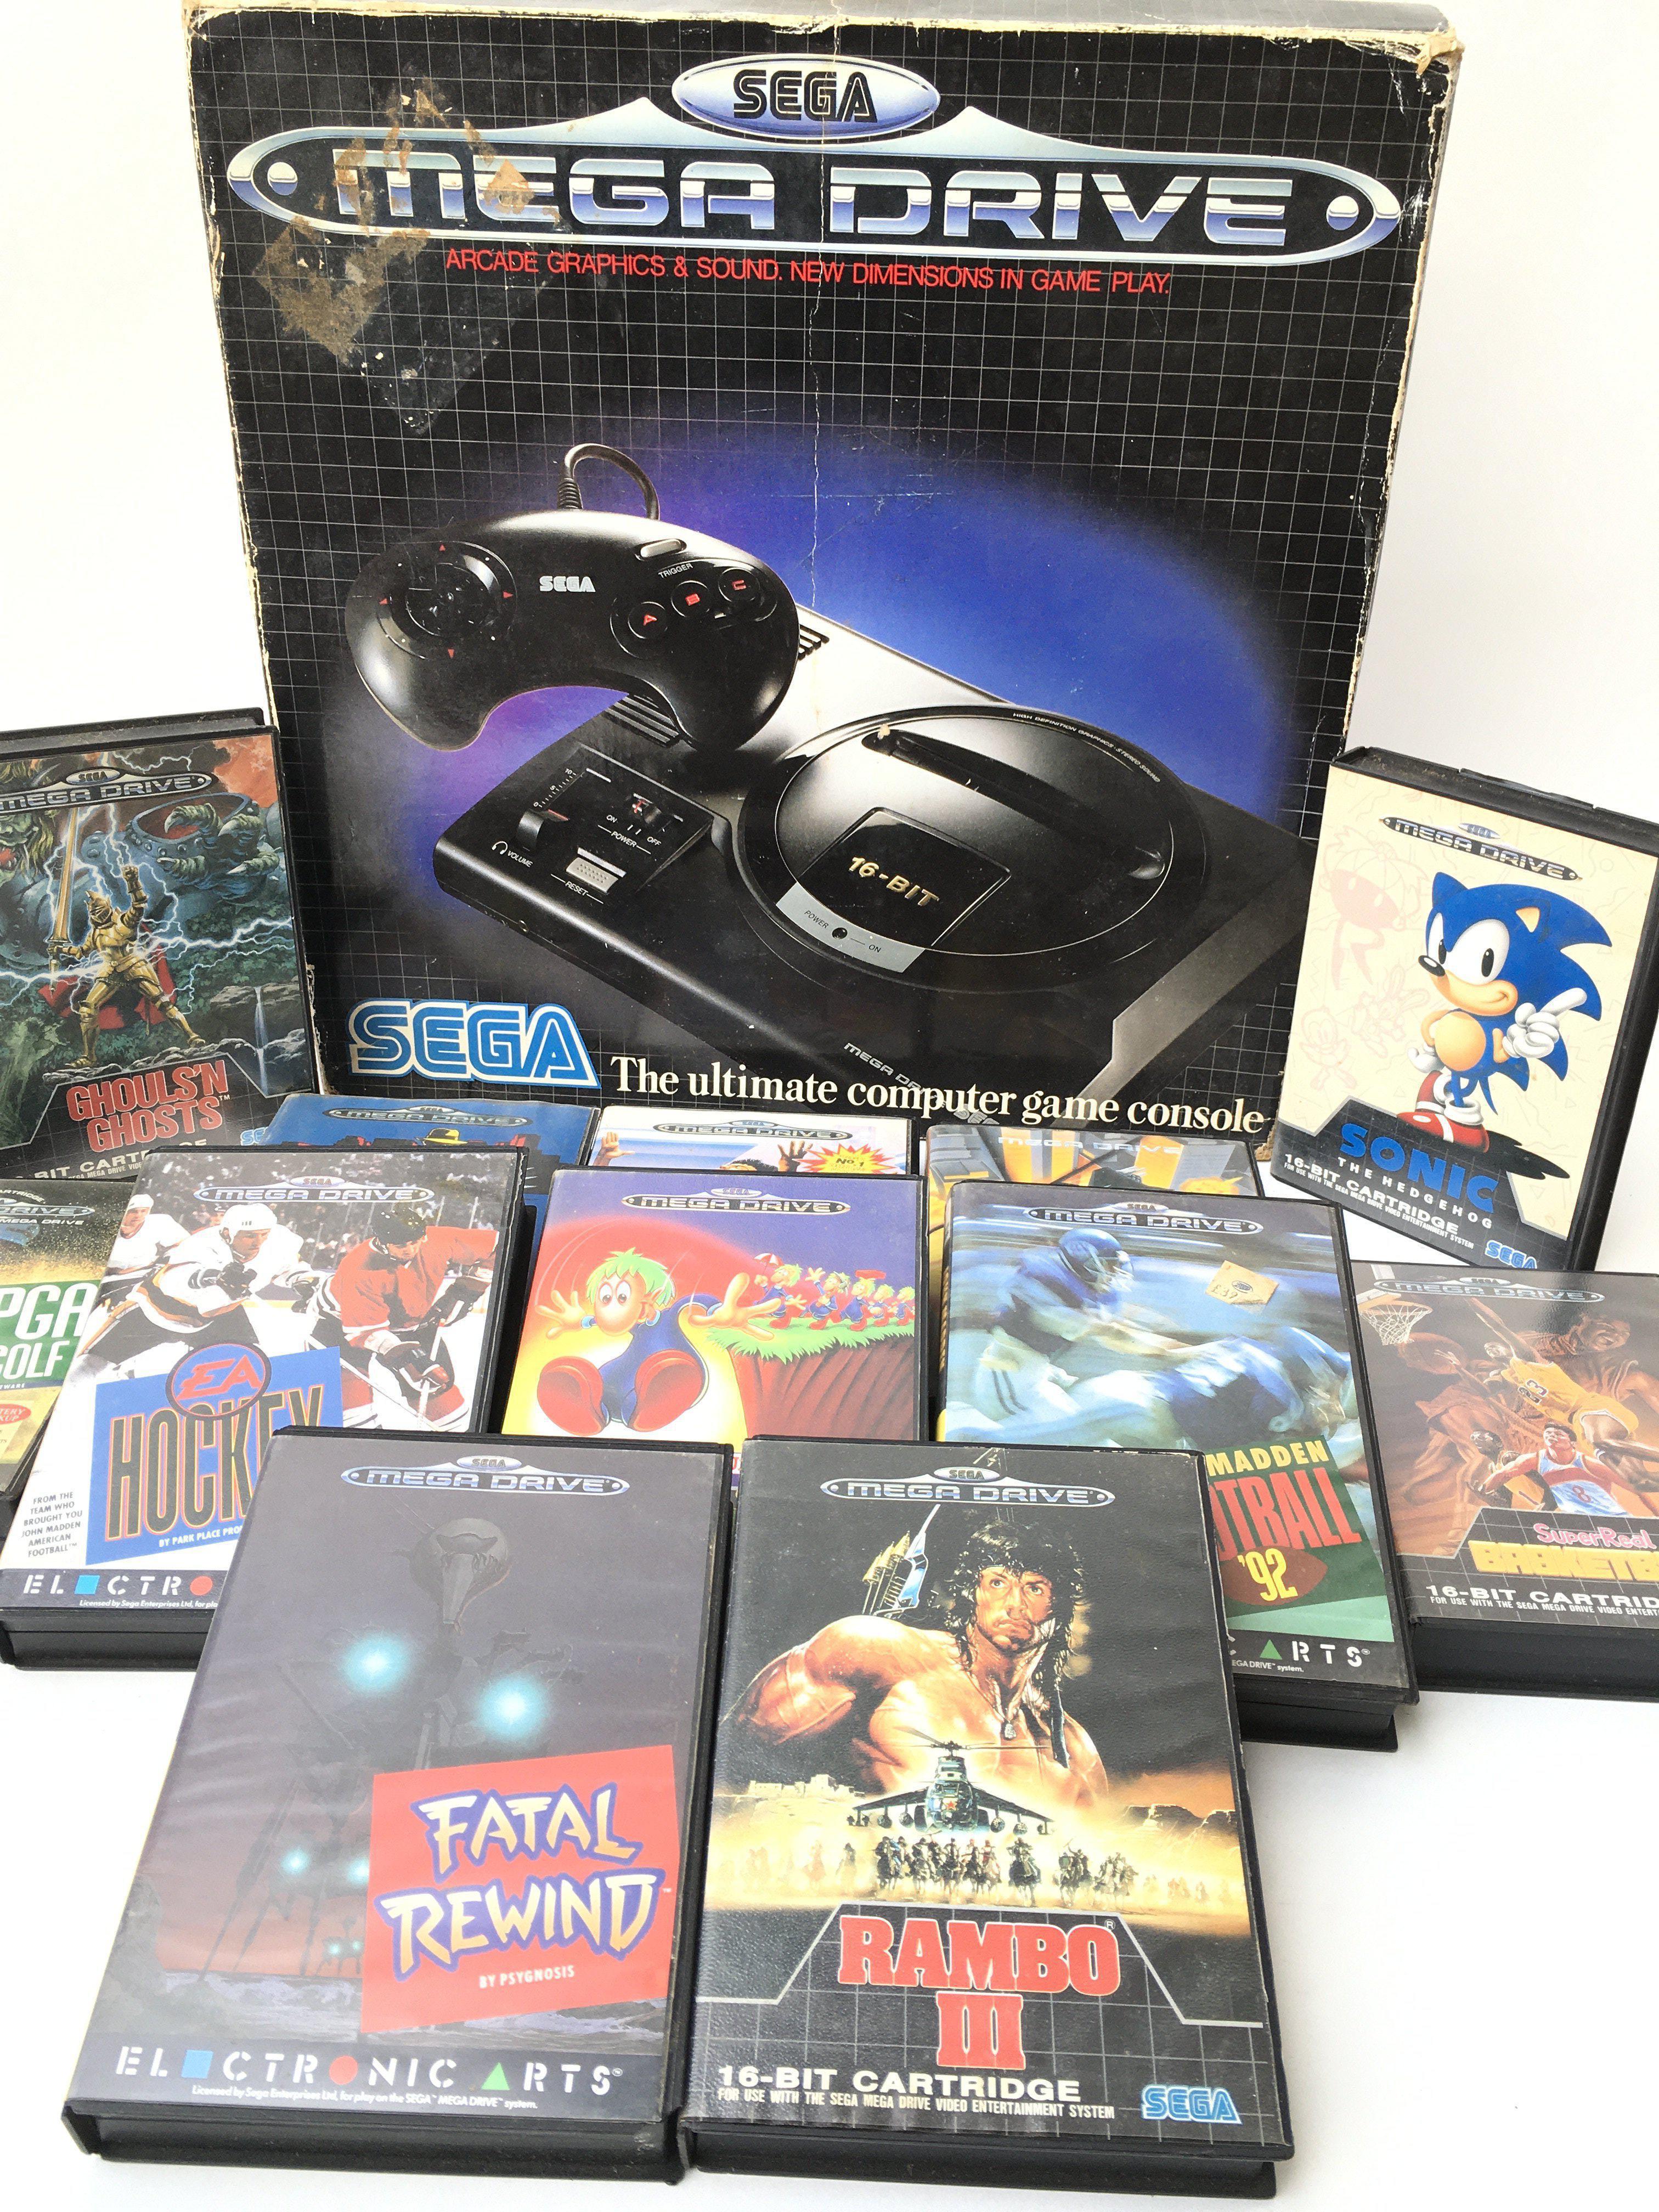 A Boxed Sega Mega Drive with games.